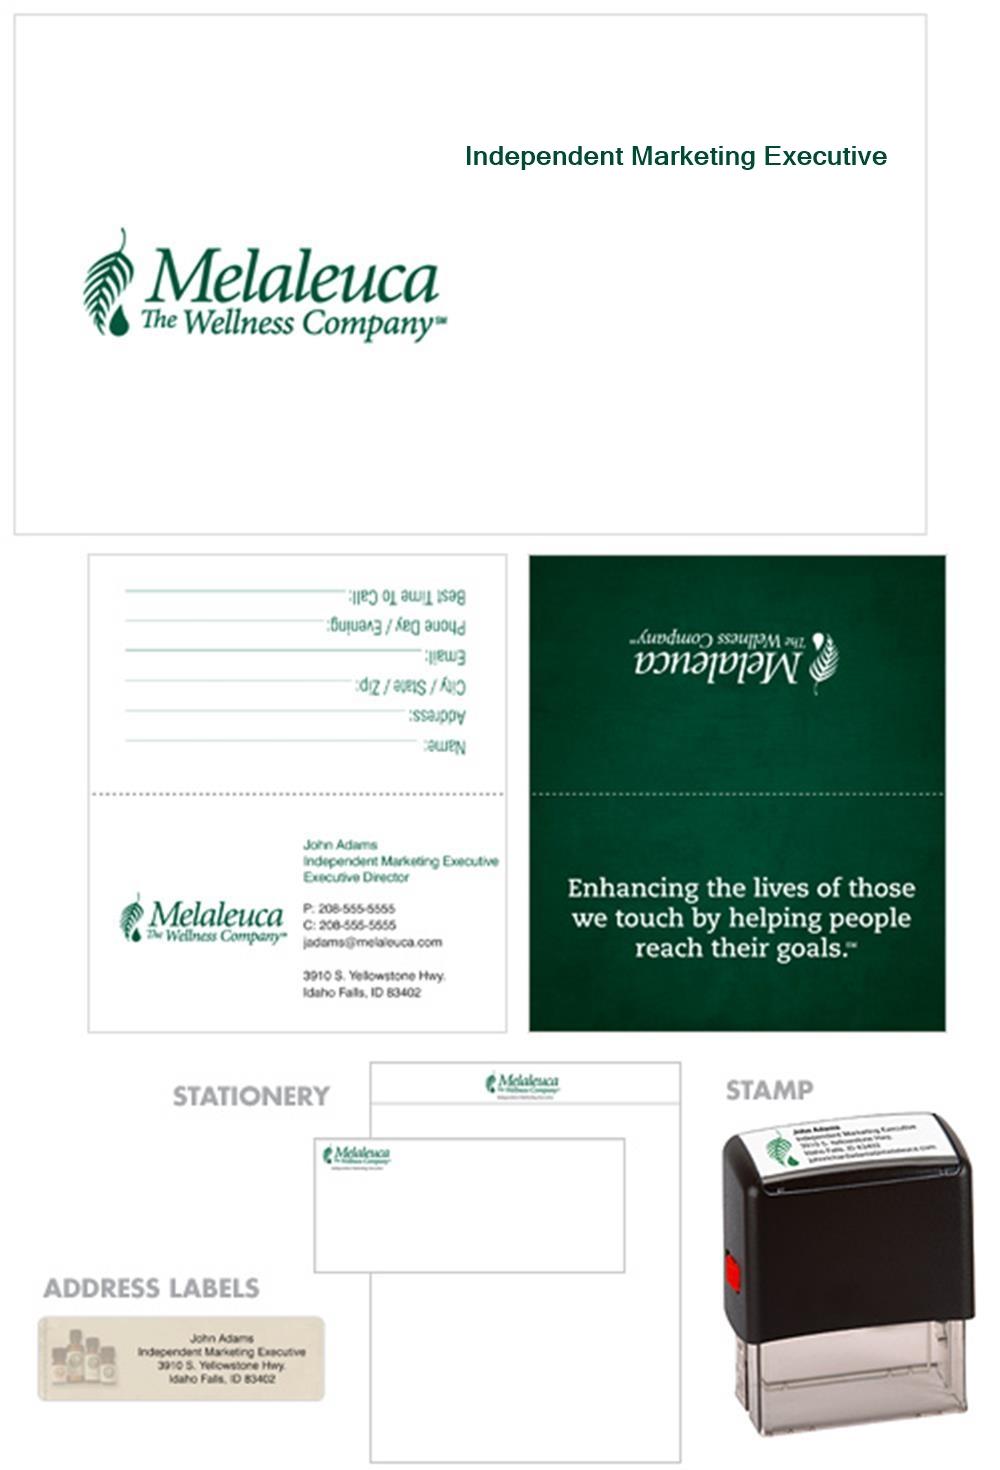 Melaleuca Business Kit - Tent Style, Green Mission Statement - Melaleuca